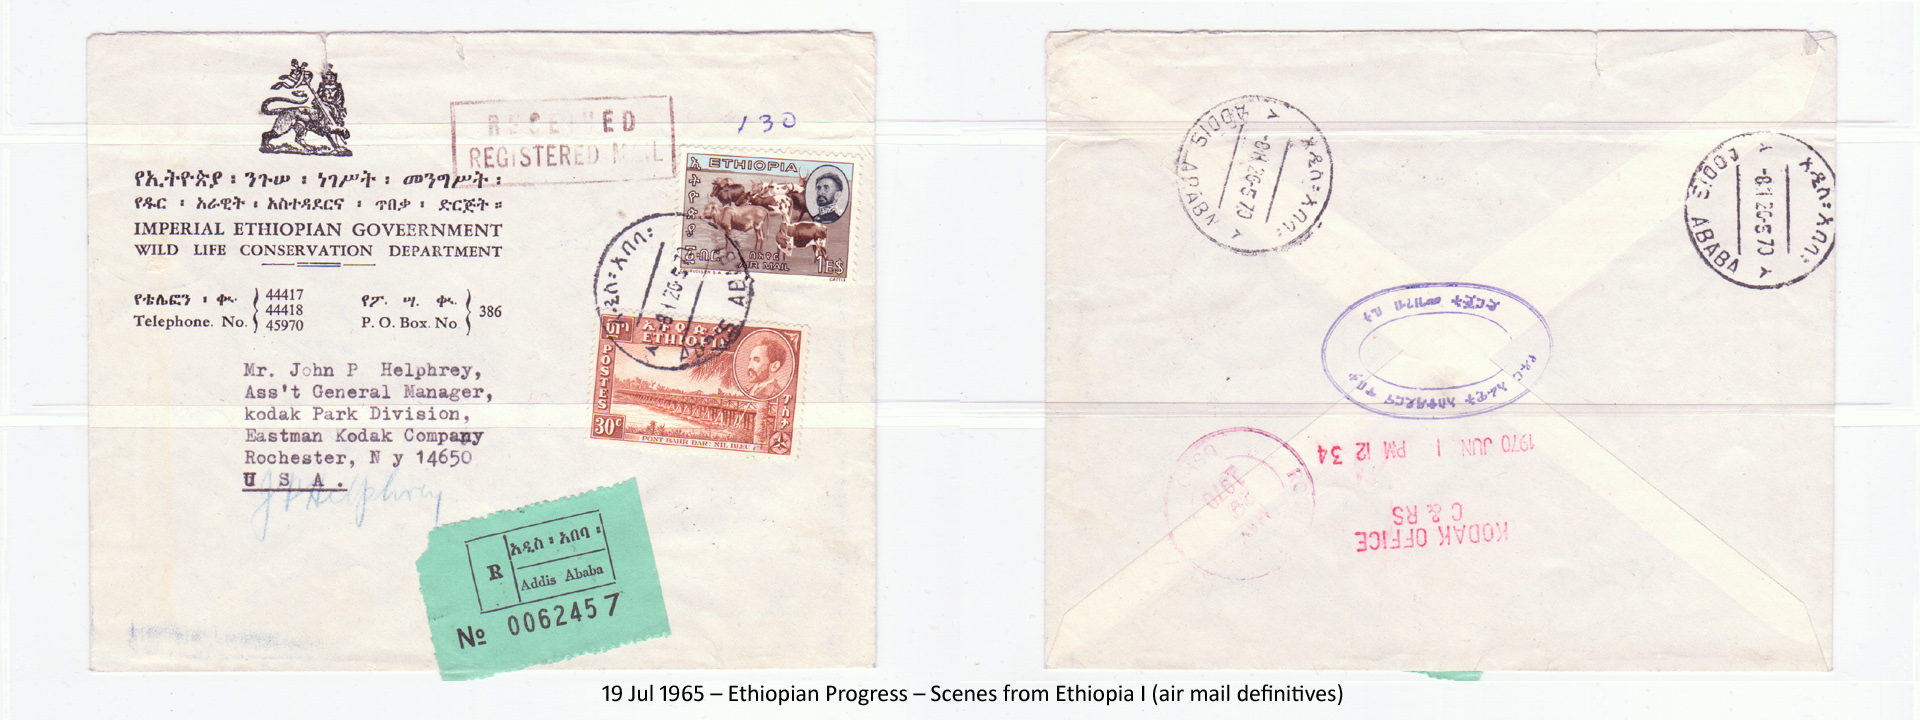 19650719 – Ethiopian Progress – Scenes from Ethiopia I (air mail definitives)